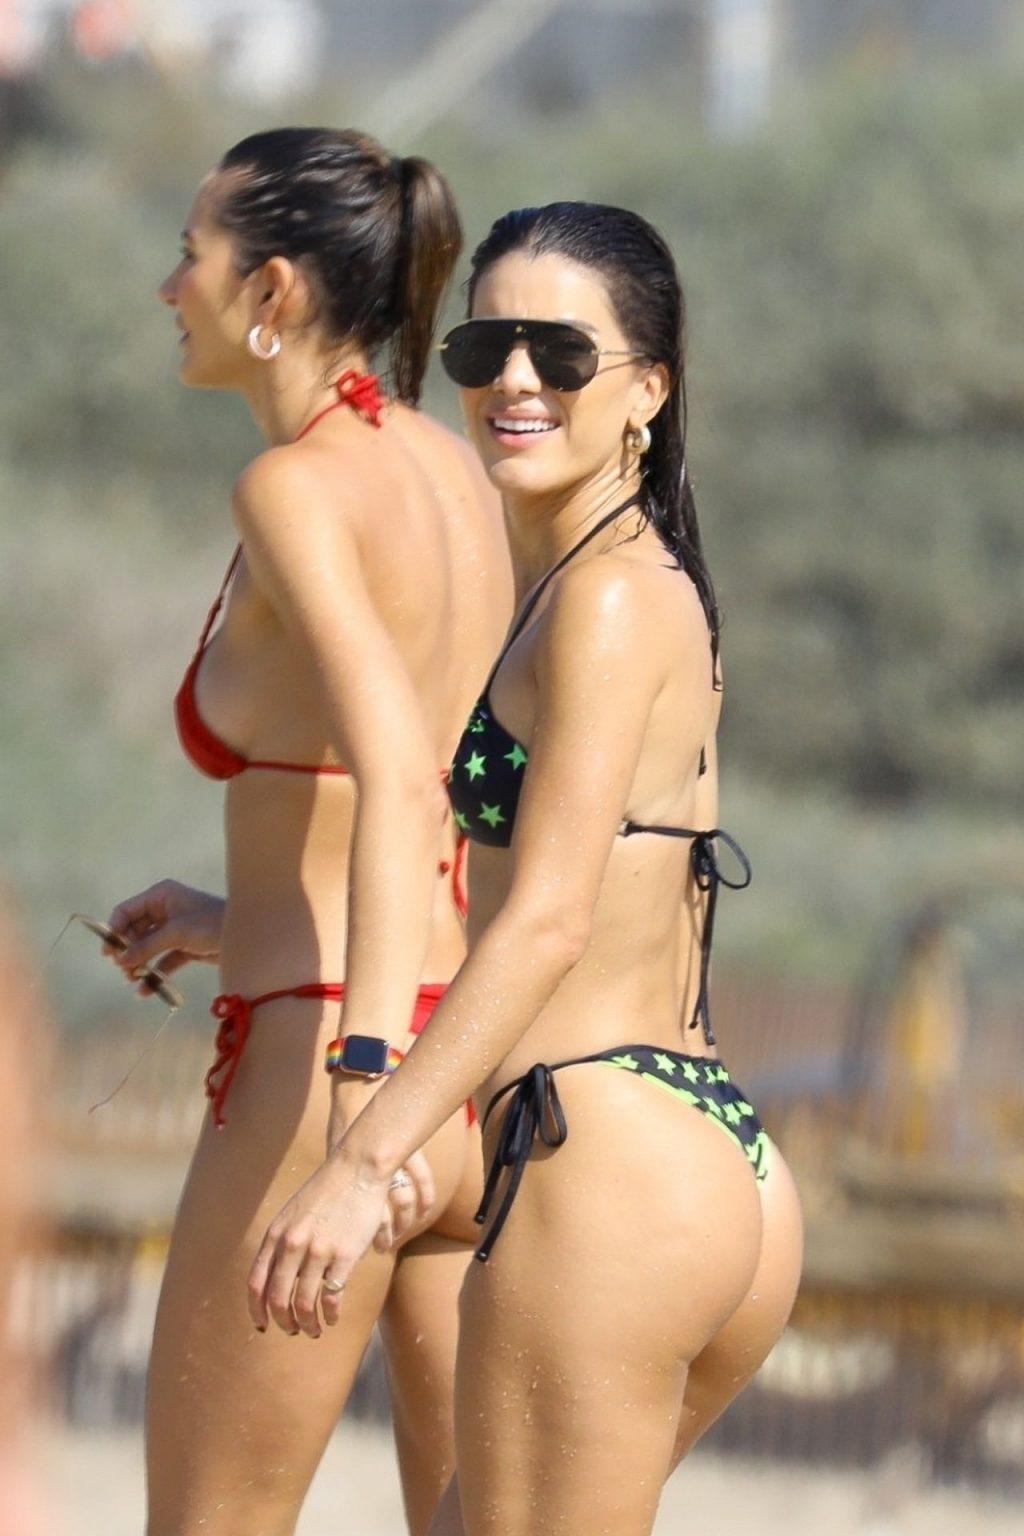 Camila Coelho Stuns in a Black and Green Bikini at the Beach (44 Photos)